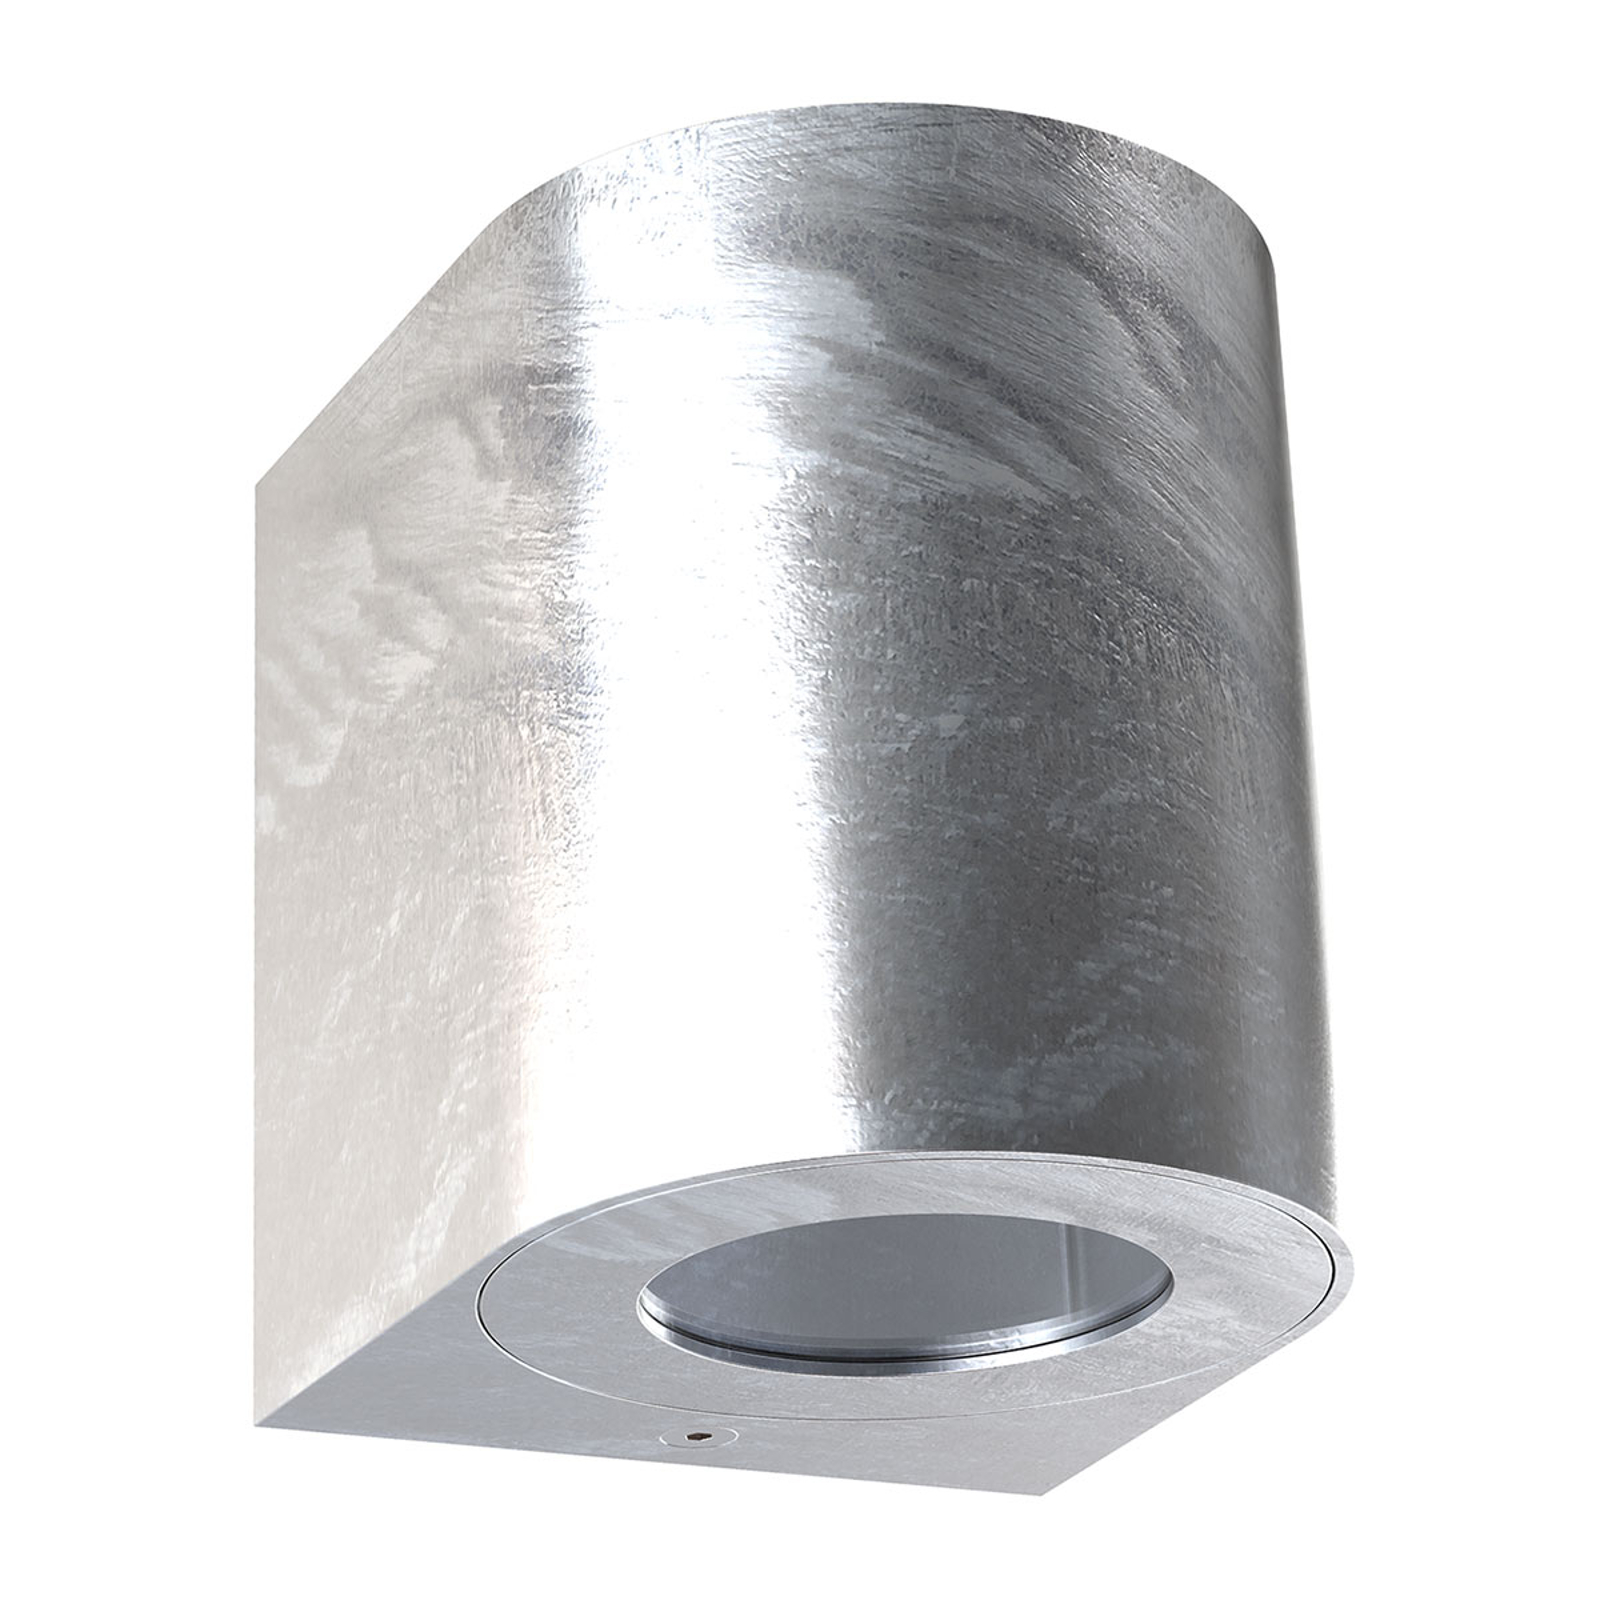 LED buitenwandlamp Canto 2, 10 cm, verzinkt